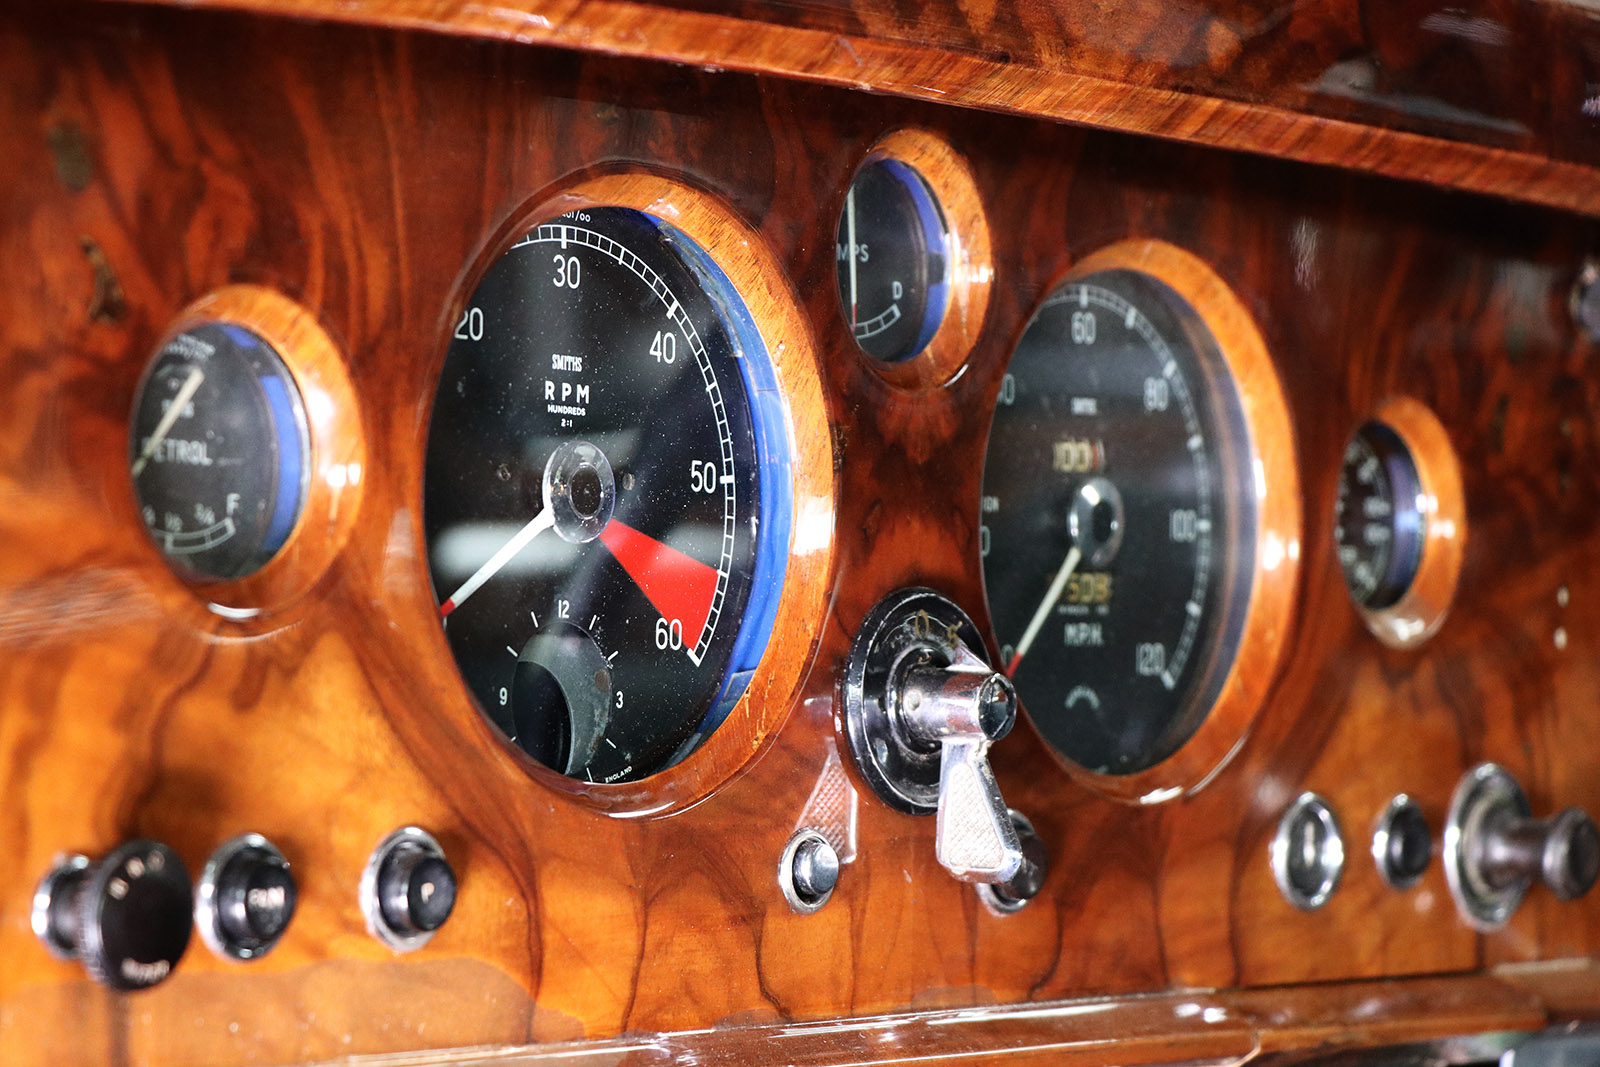 1959_Jaguar_Mark 1_sayer selection_duncan hamilton_lady cheatham_23_web.jpg